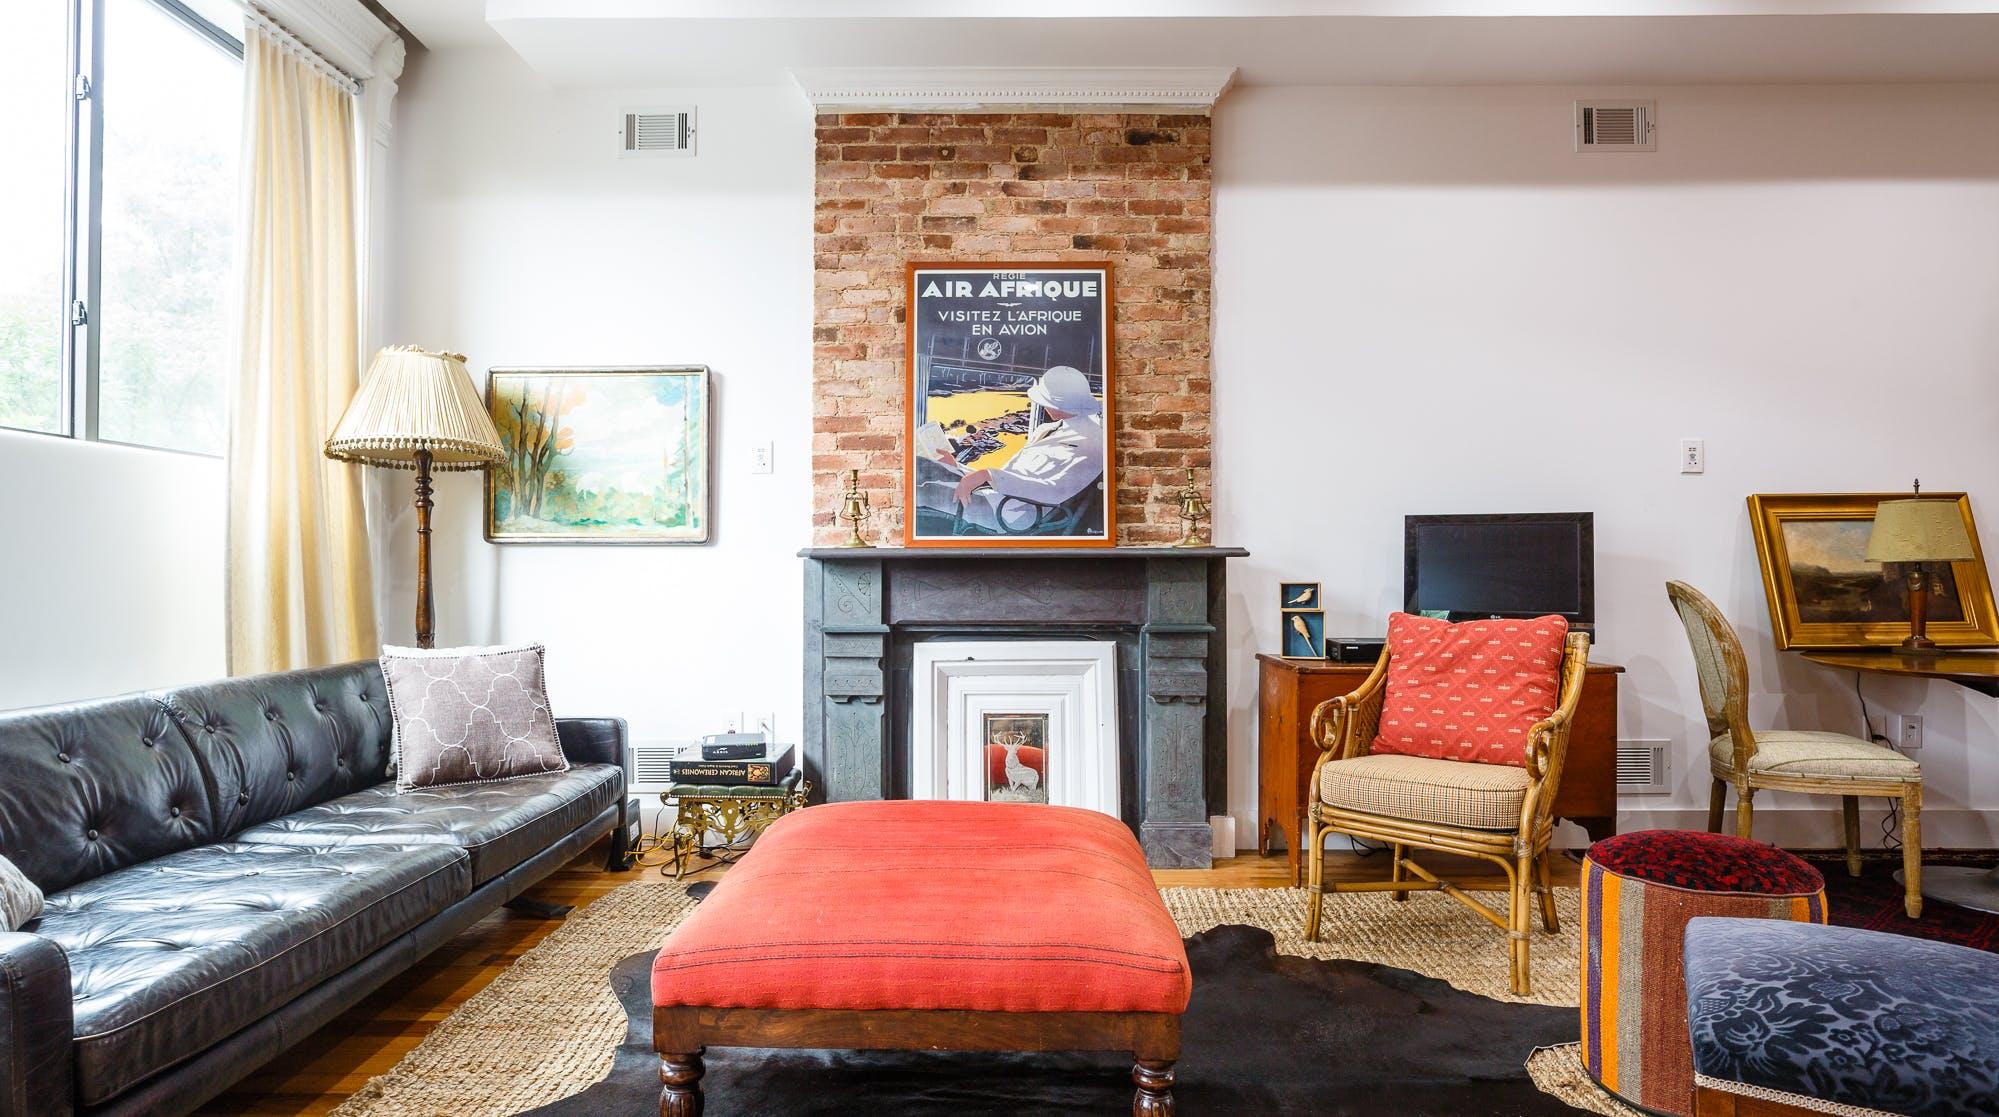 Brick and Mortar, Bedford-Stuyvesant, New York | The Plum Guide